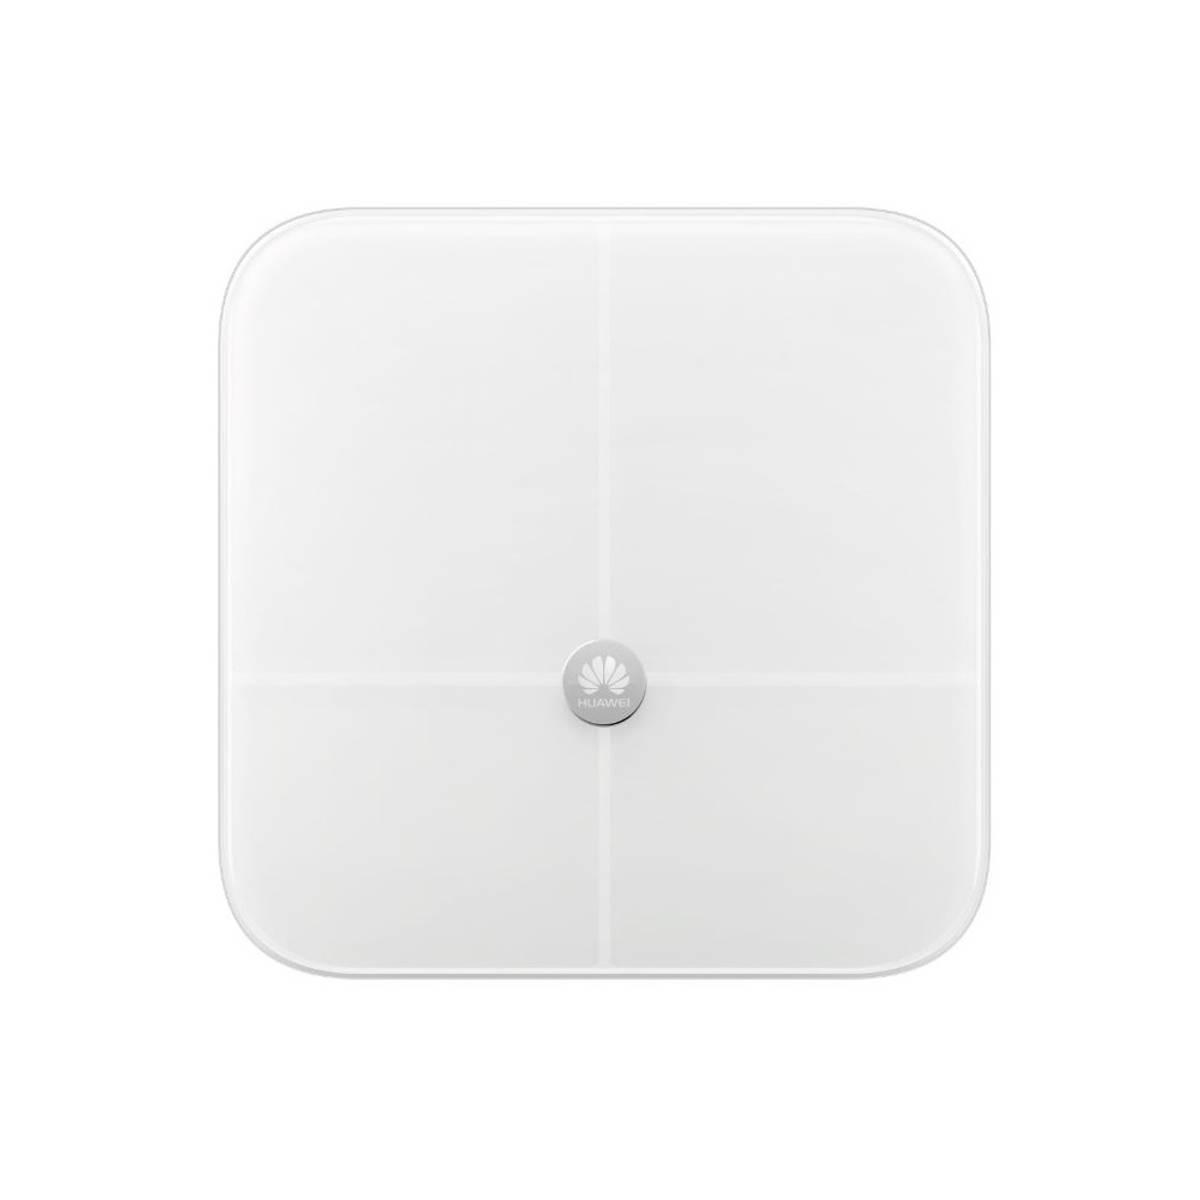 Huawei AH100 smart badevekt white